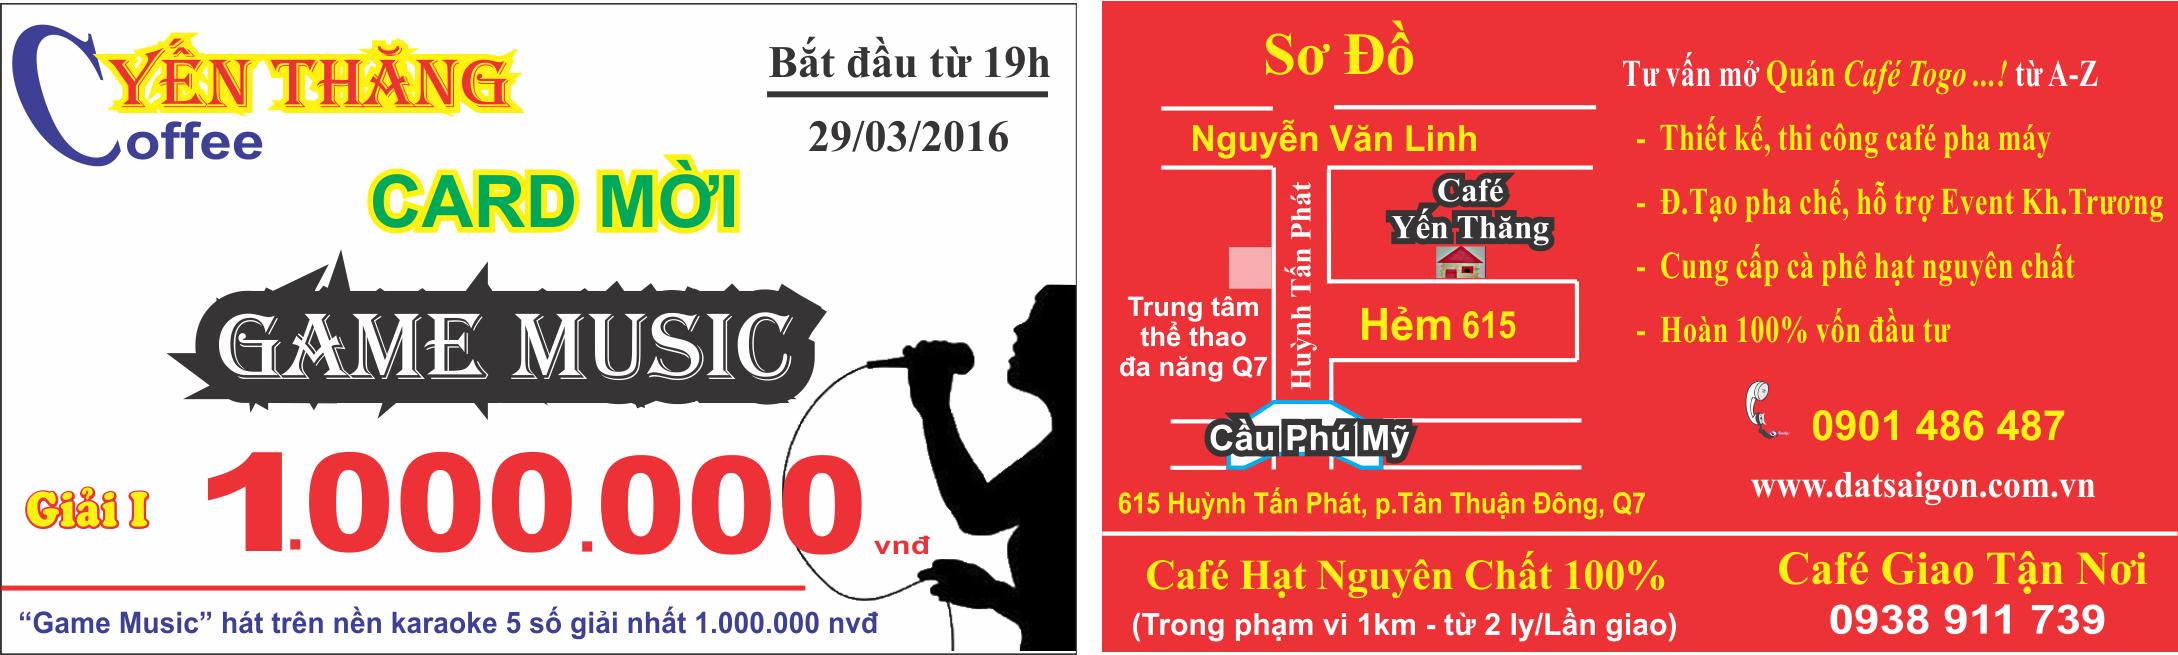 Card mời Game Music cafe Yến Thăng